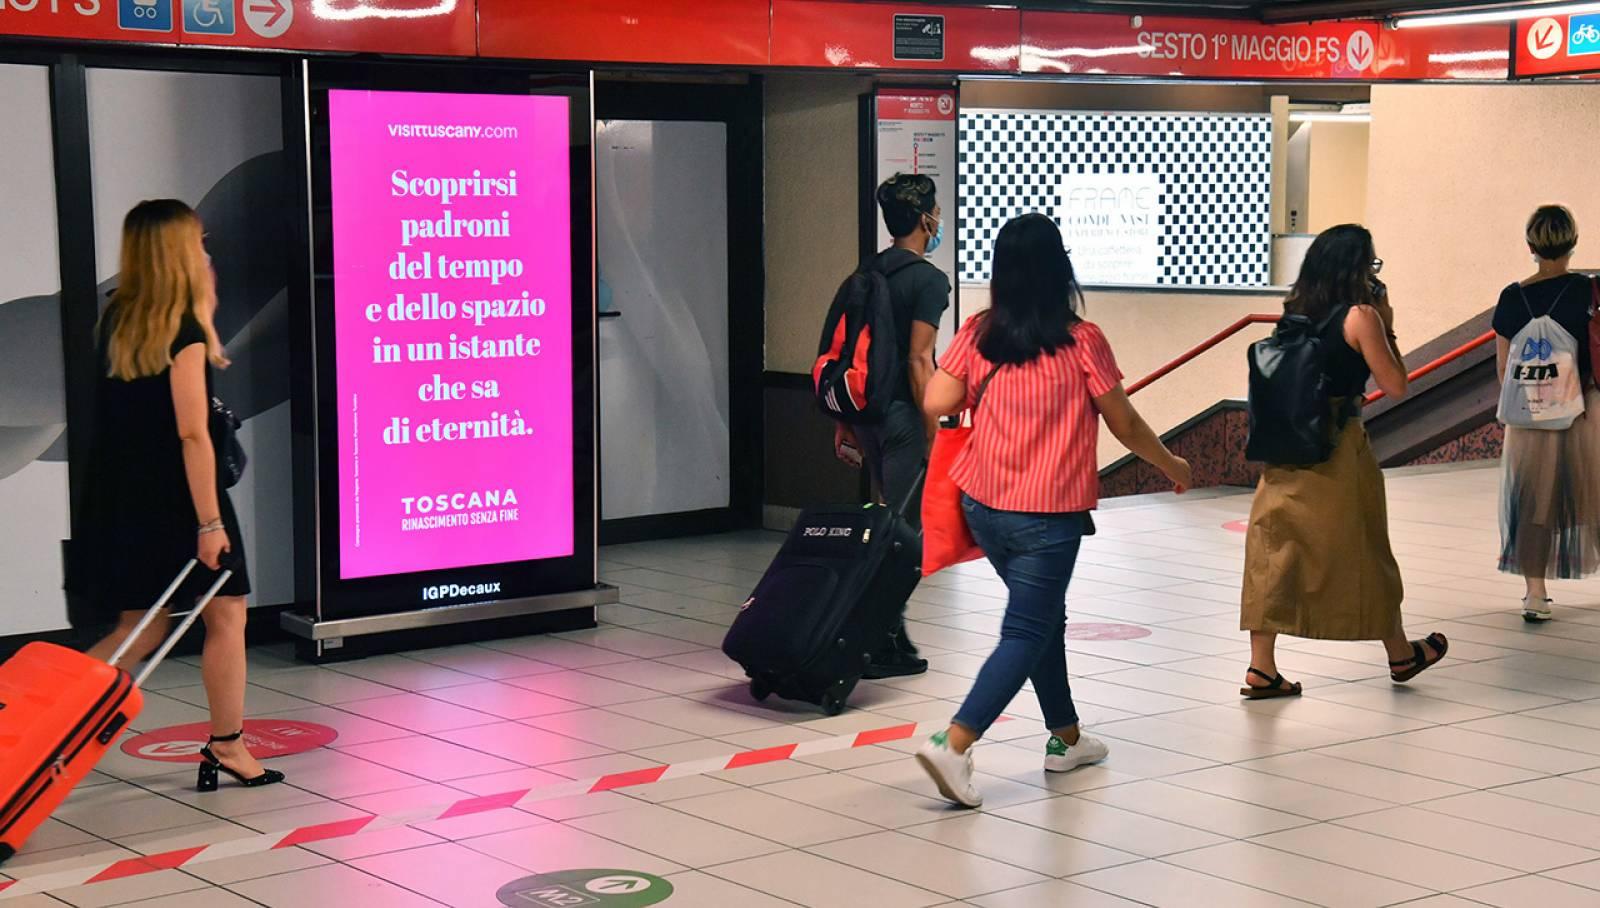 IGPDecaux OOH Milano Network Vision metropolitana per Toscana Promozione Turistica